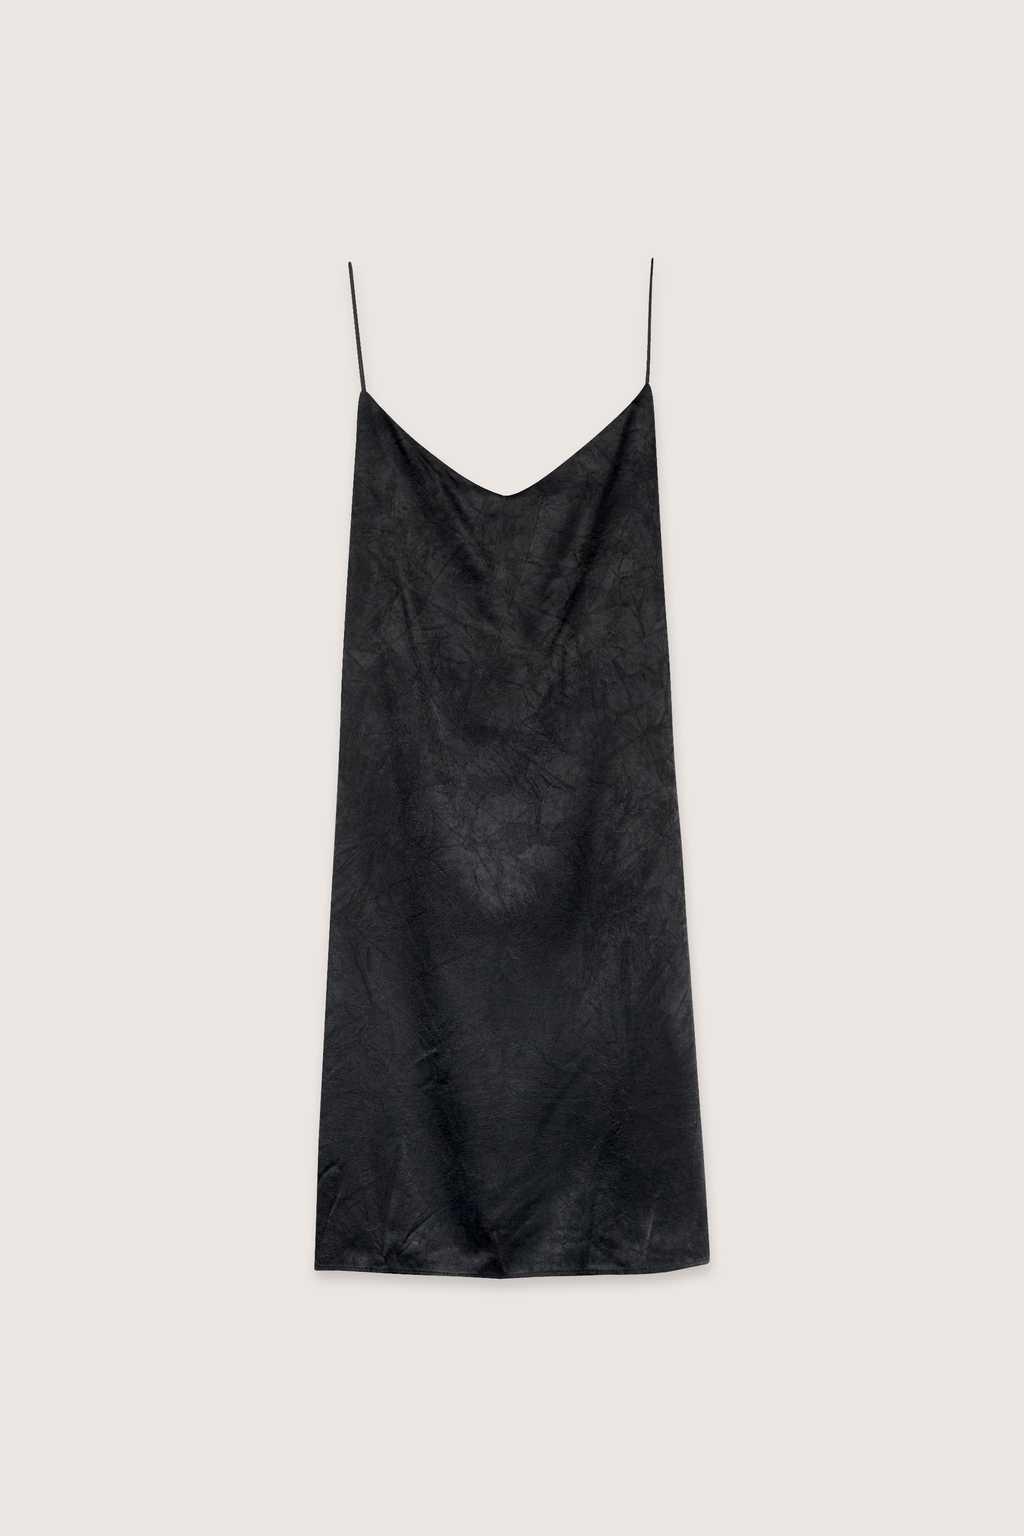 Dress H233 Black 7